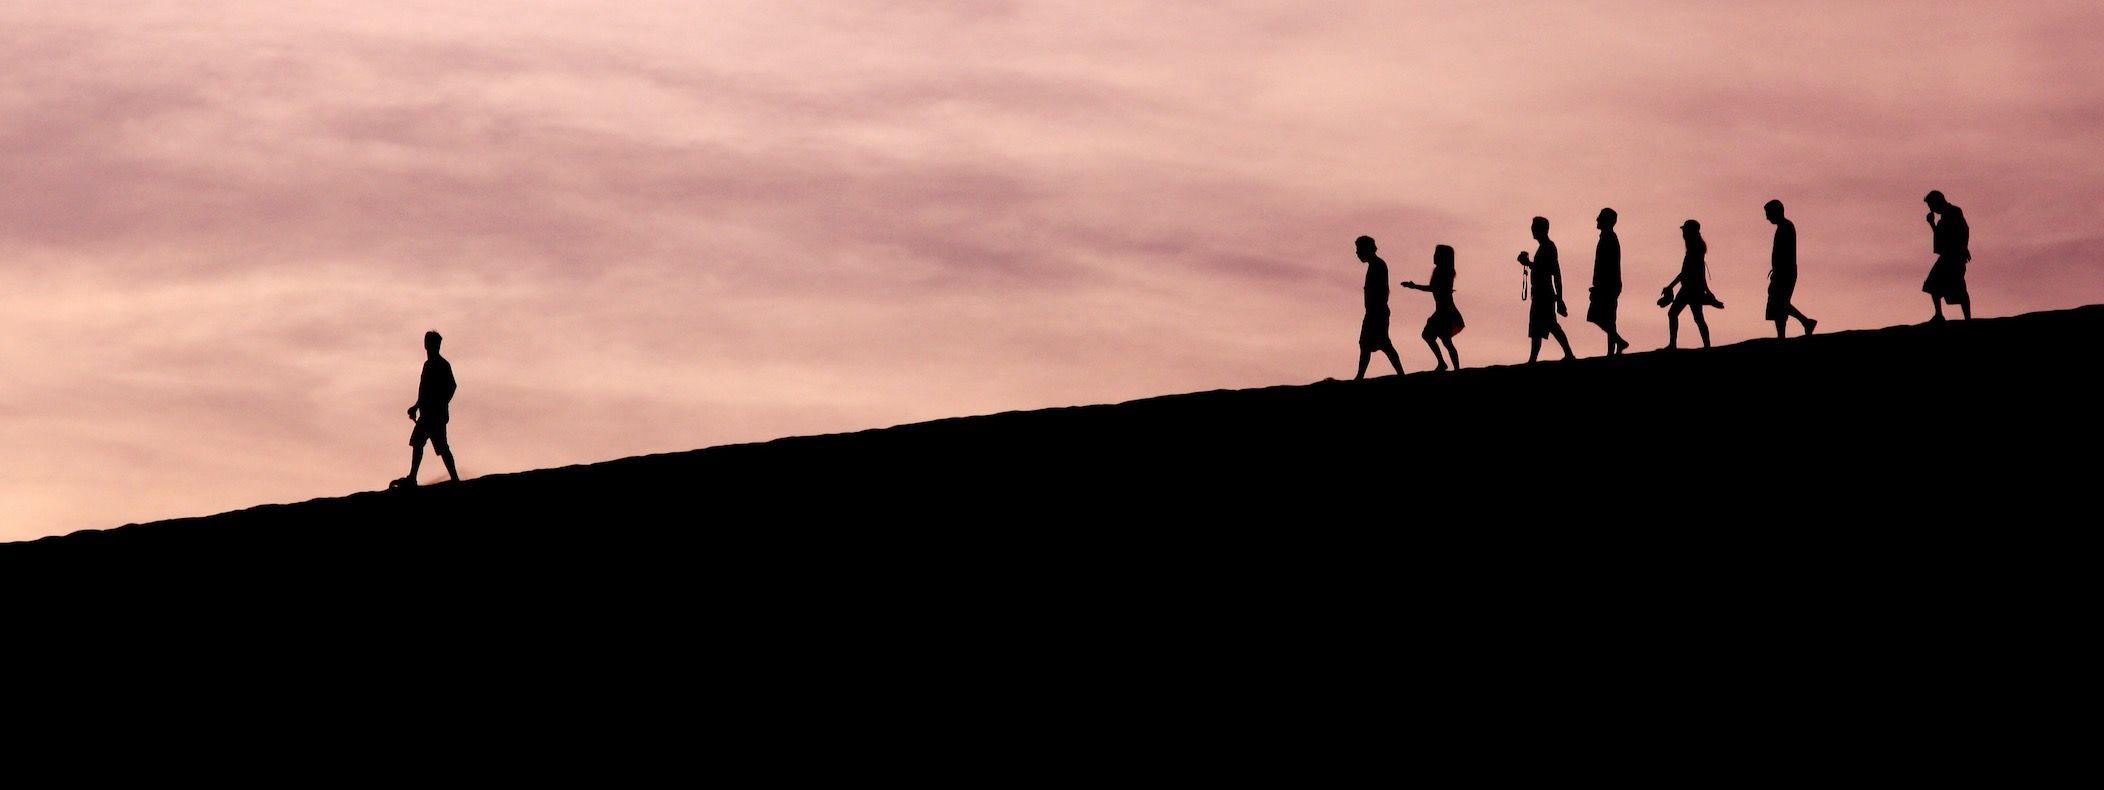 Manažér ako líder a motivátor